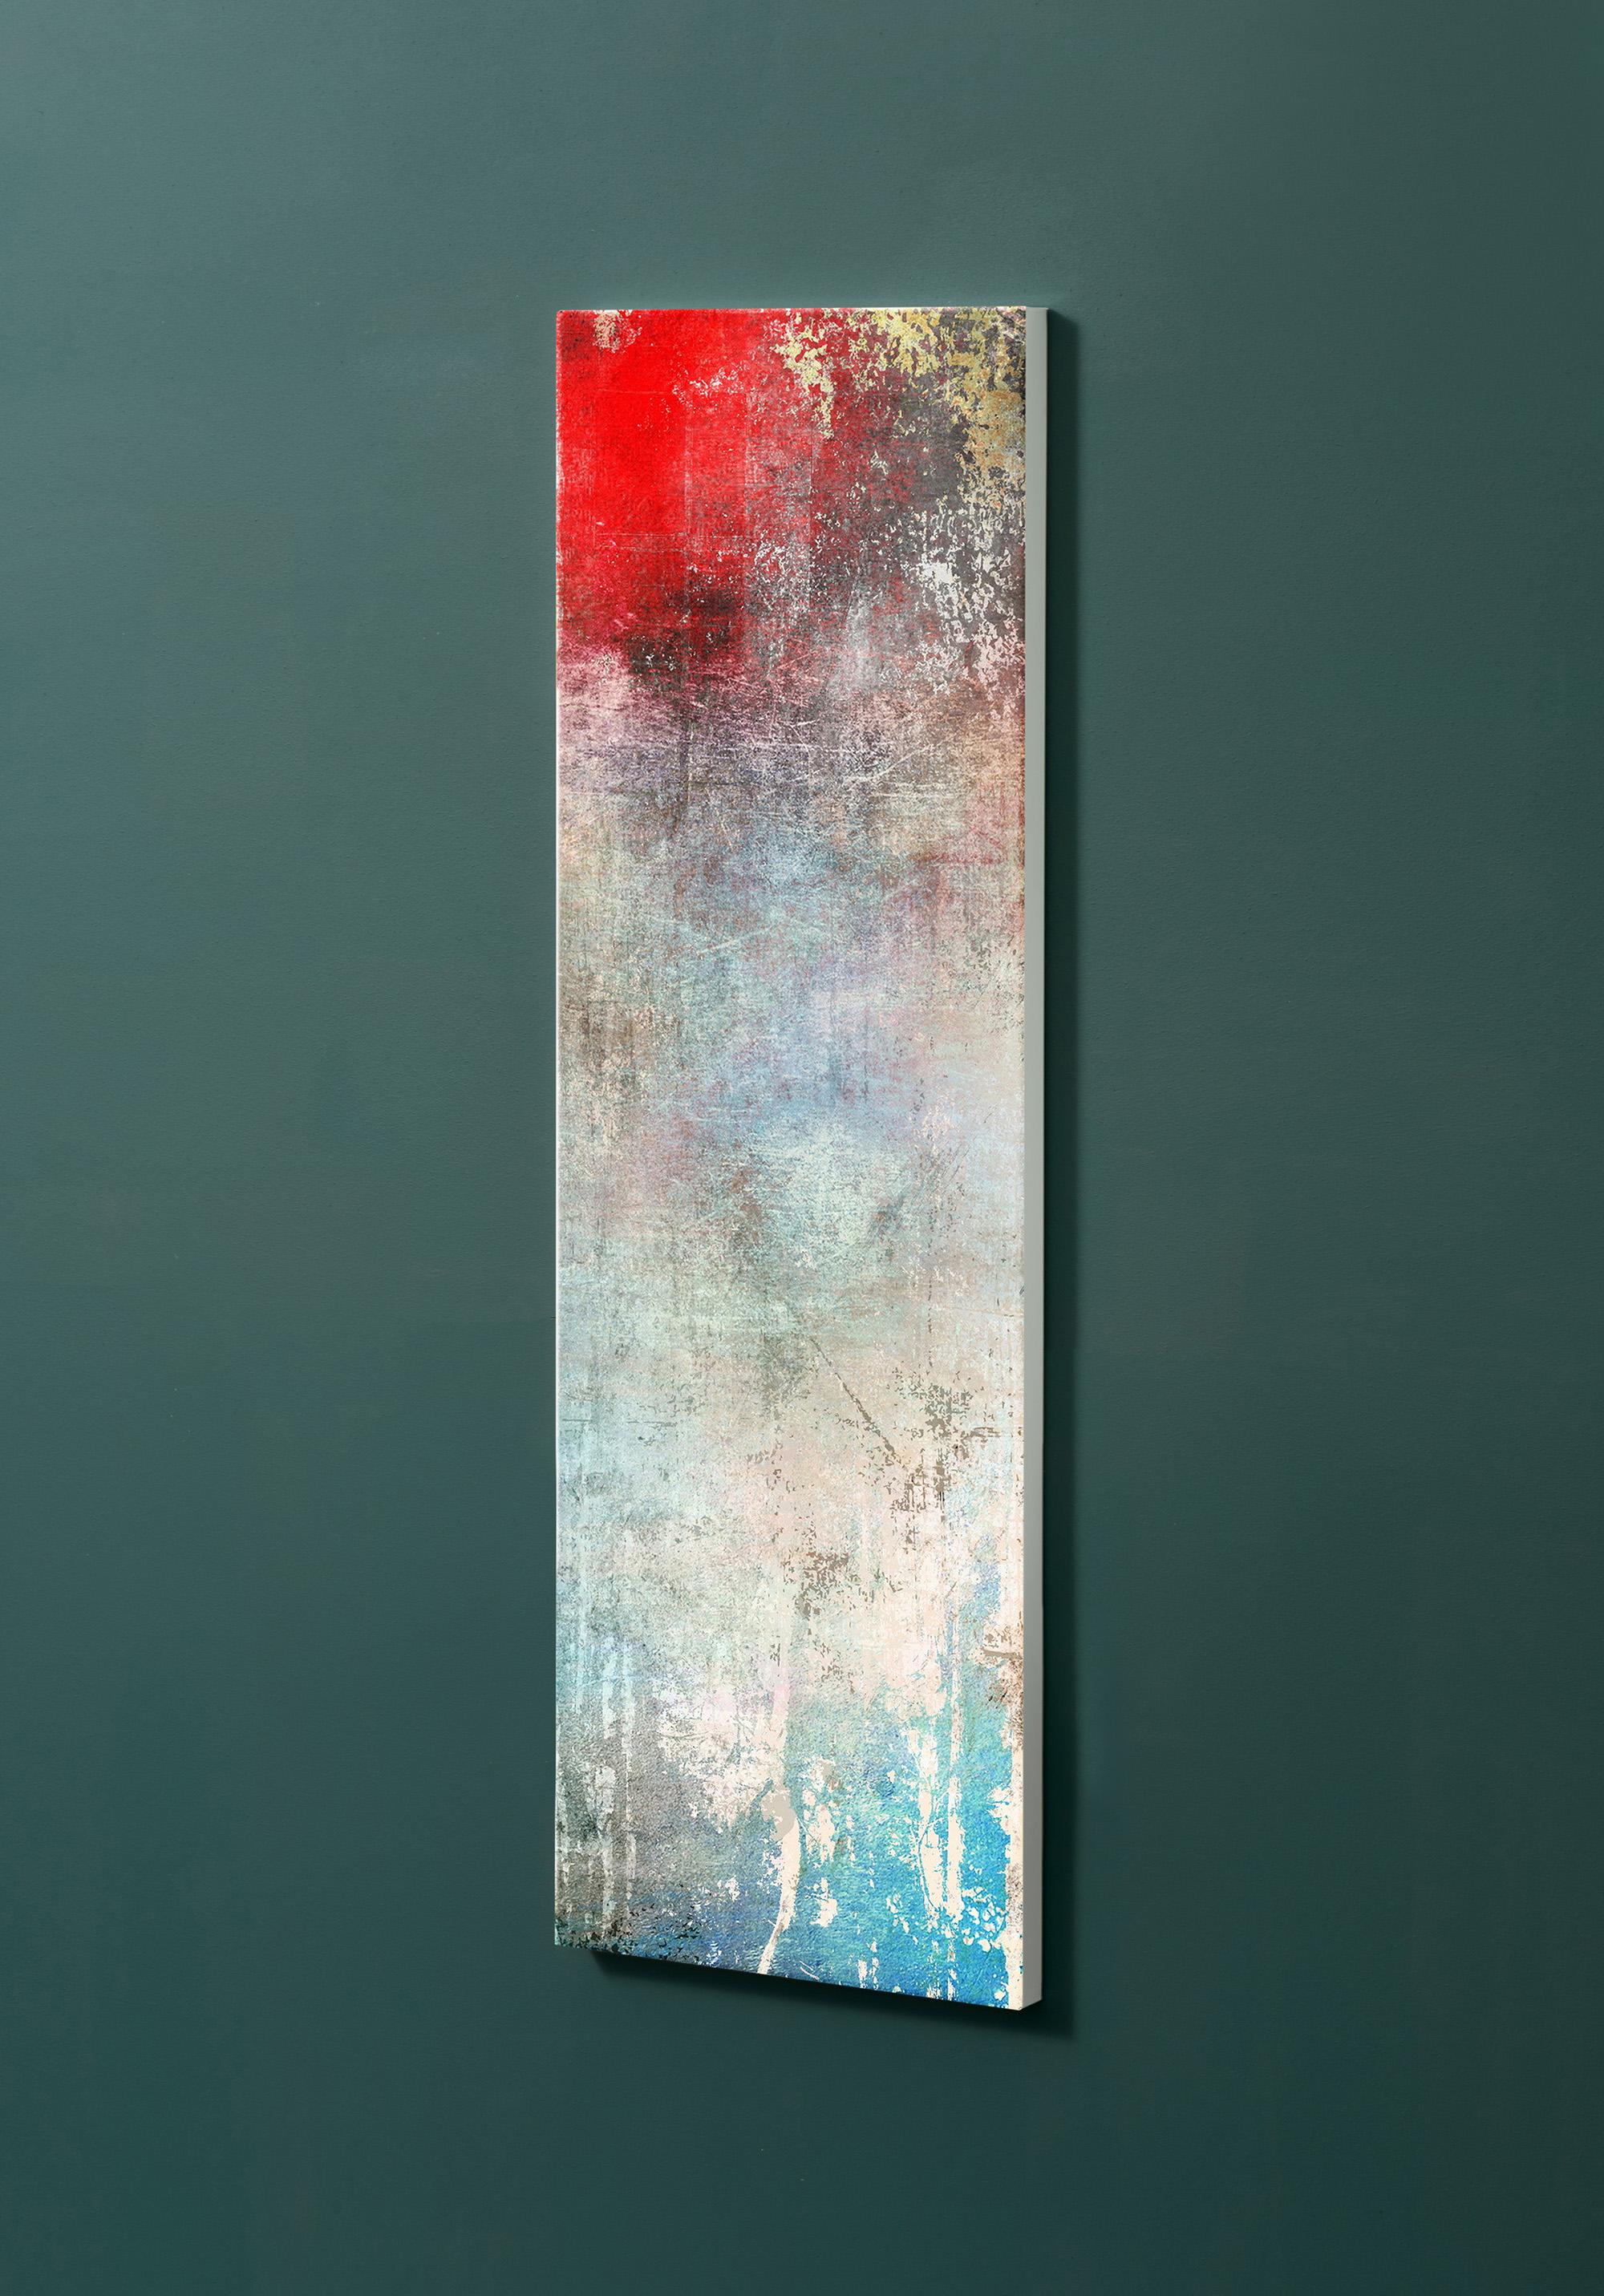 Magnettafel NOTIZ 30x90cm Motiv-Pinnwand M26 Abstrakt Kunst